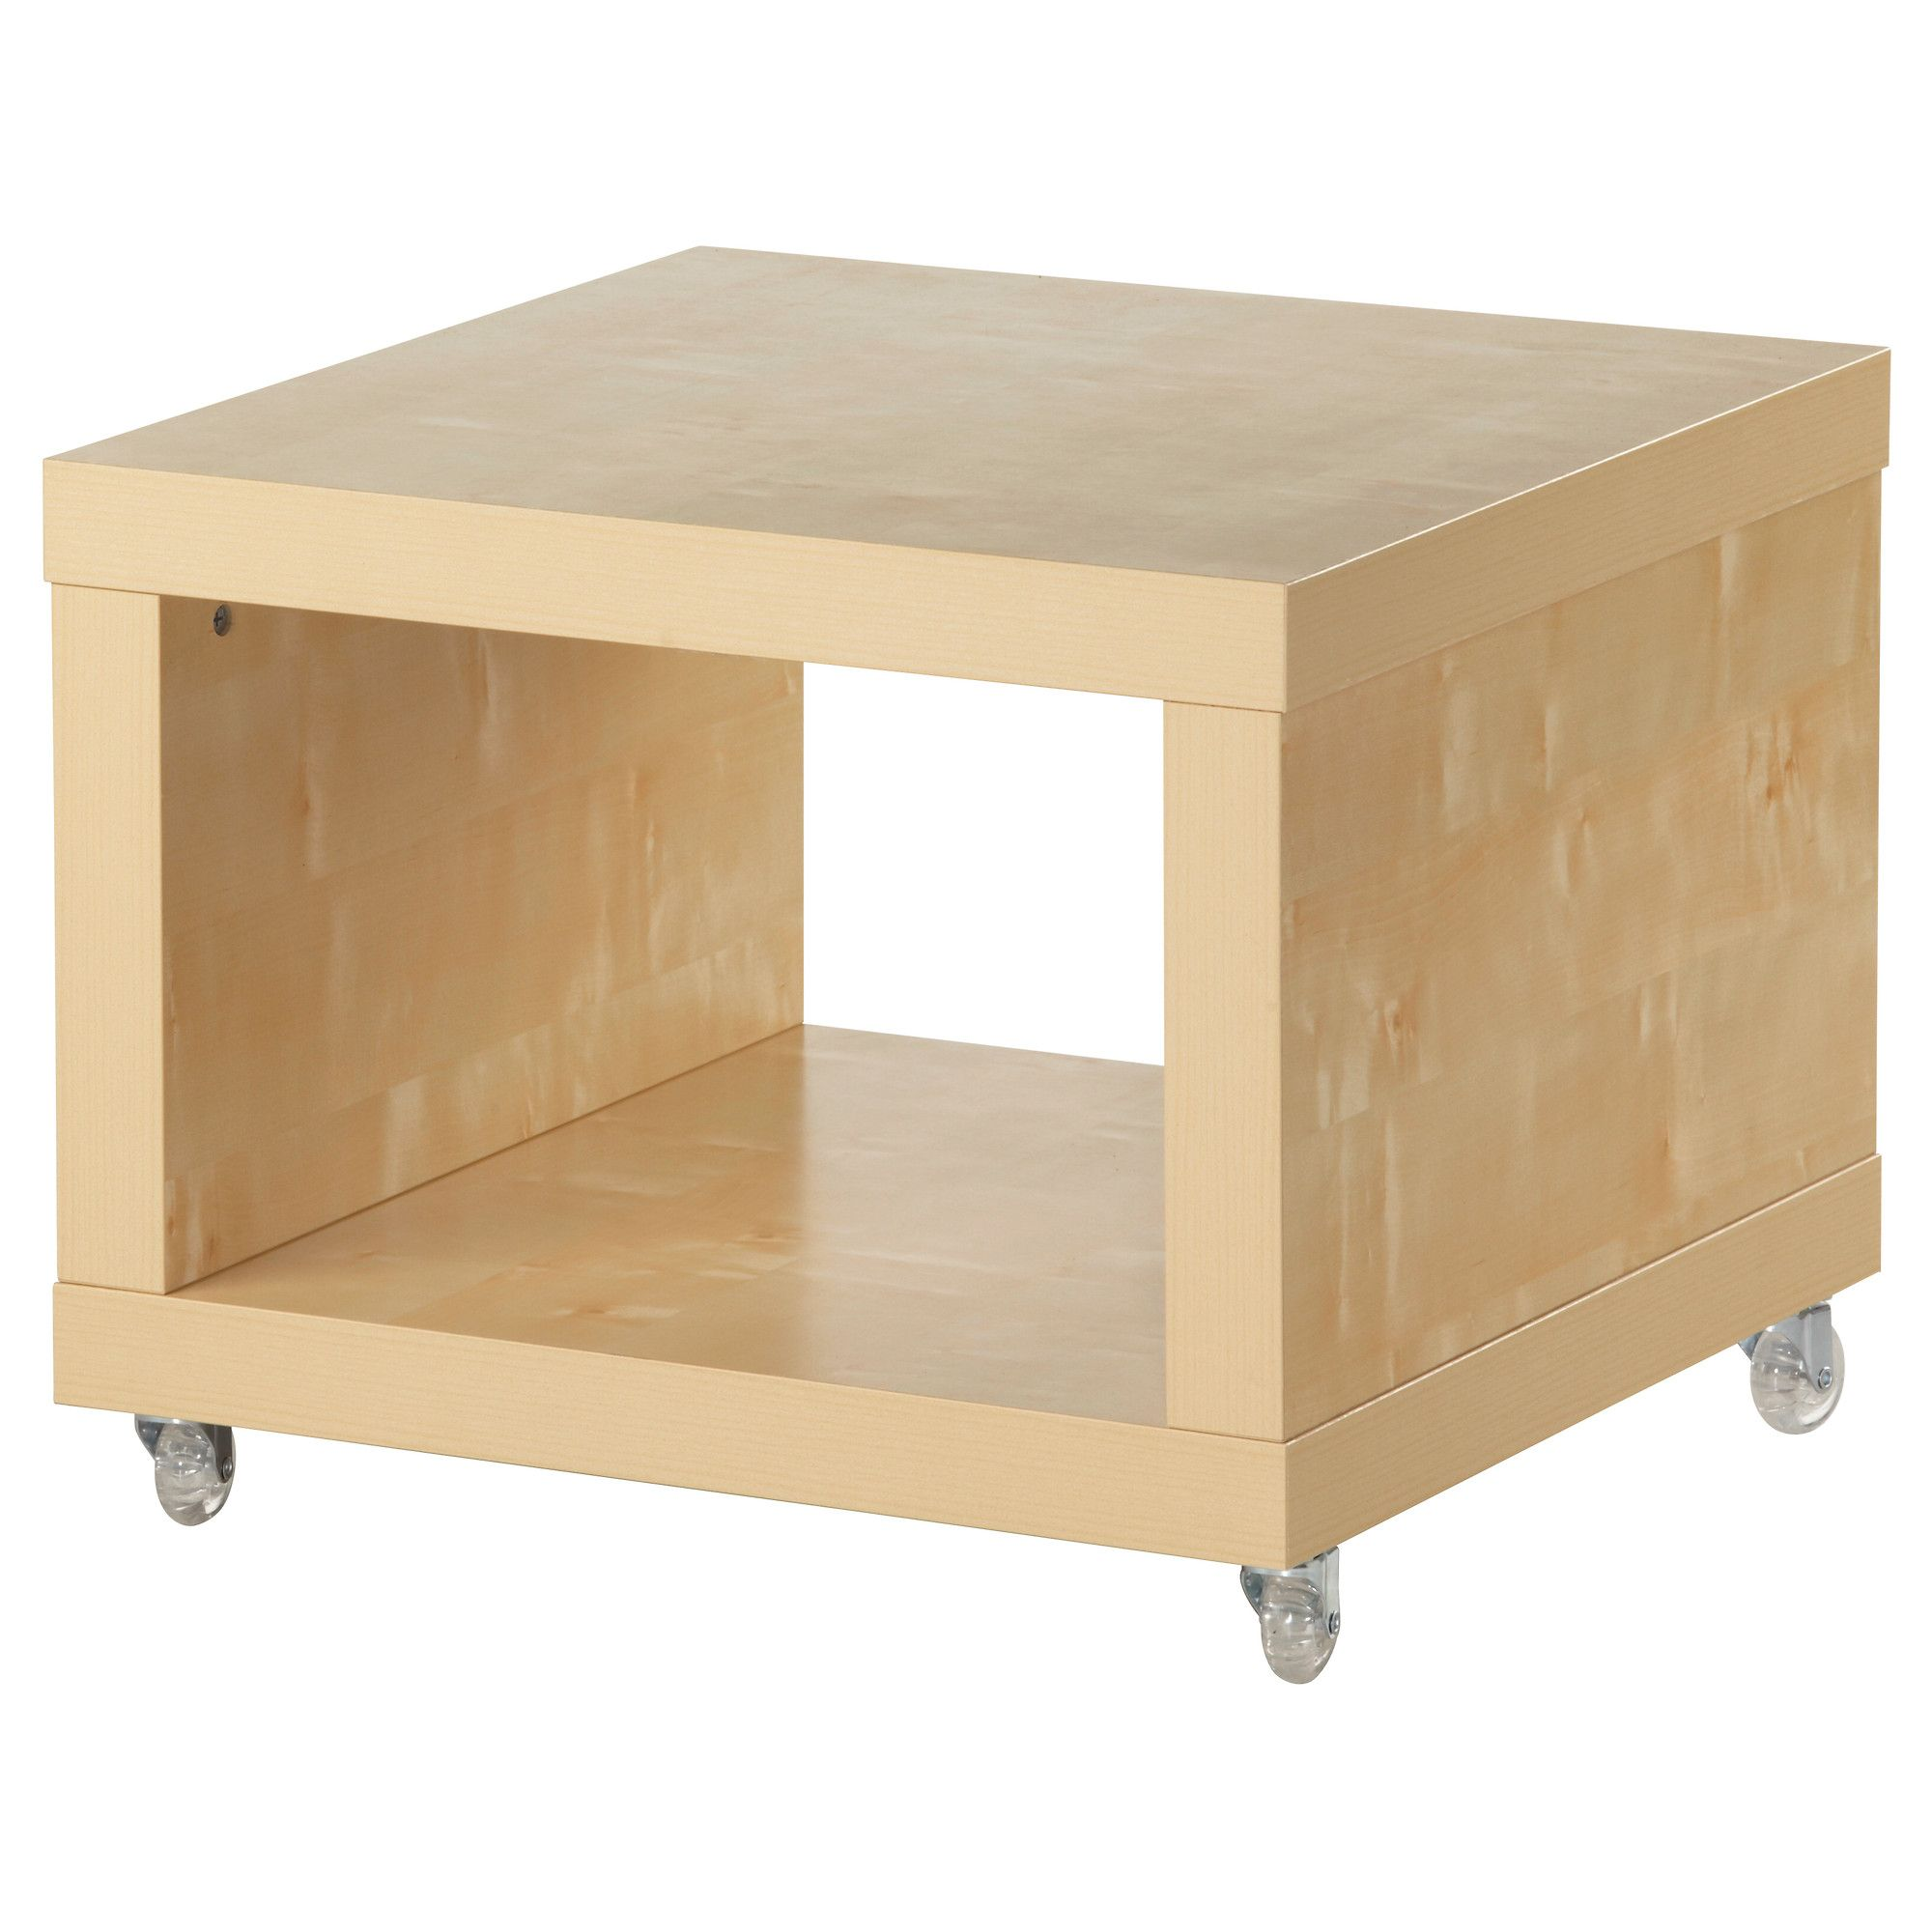 LACK Τραπεζάκι με ροδάκια IKEA Ikea Wishlist